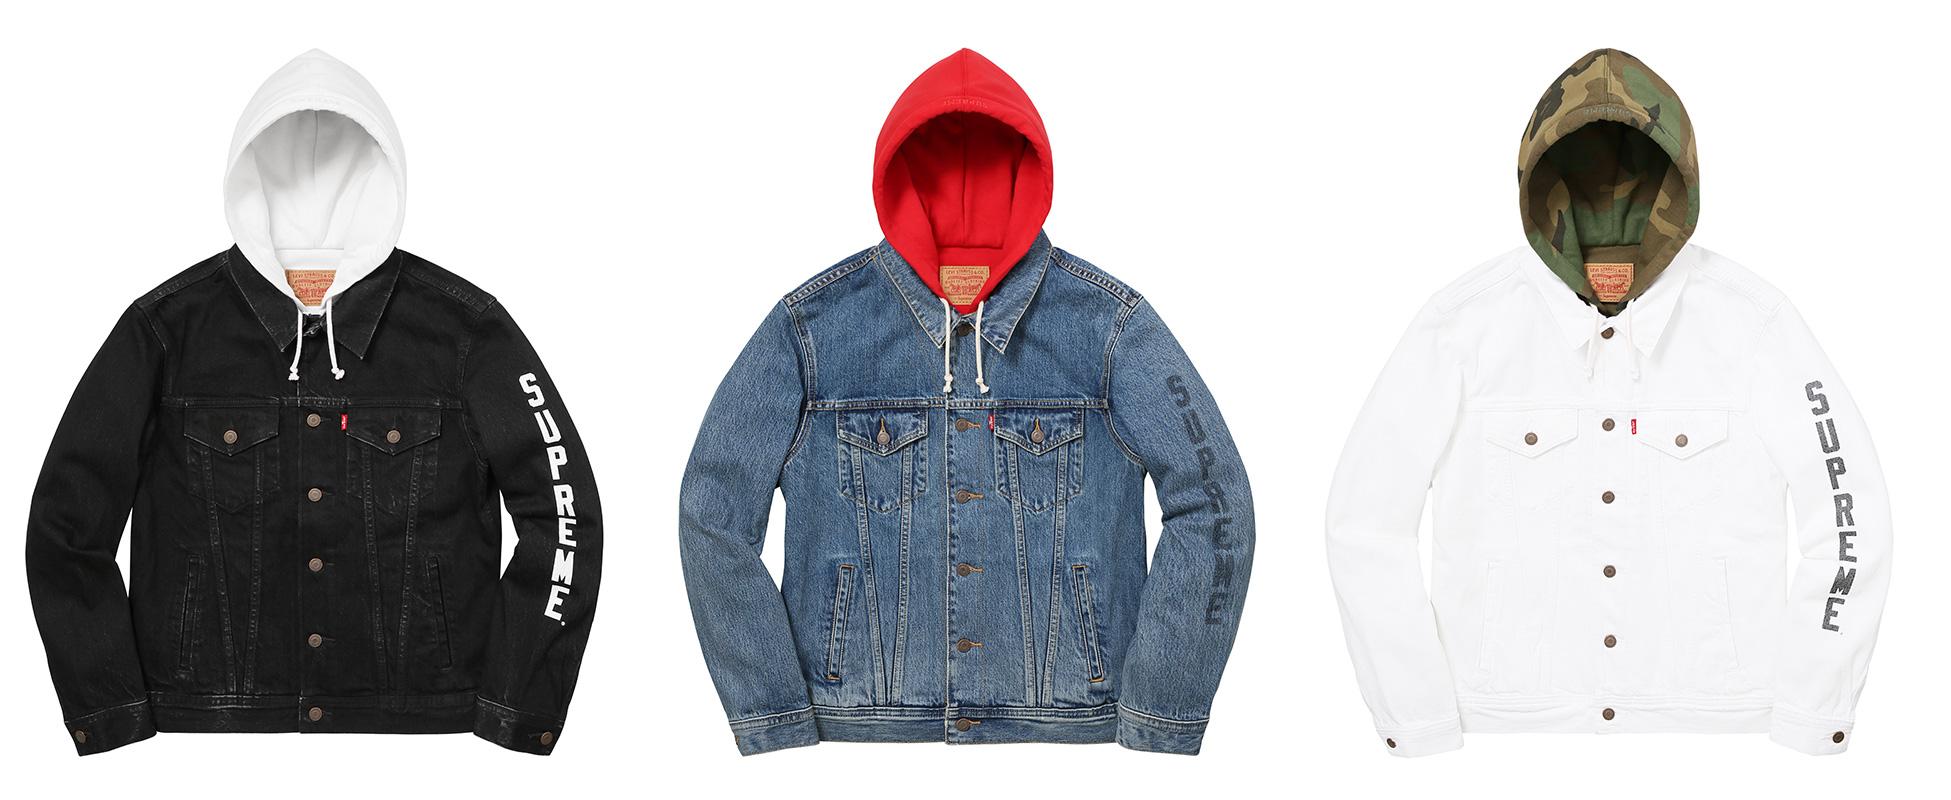 Supreme X Levi's Denim Jackets